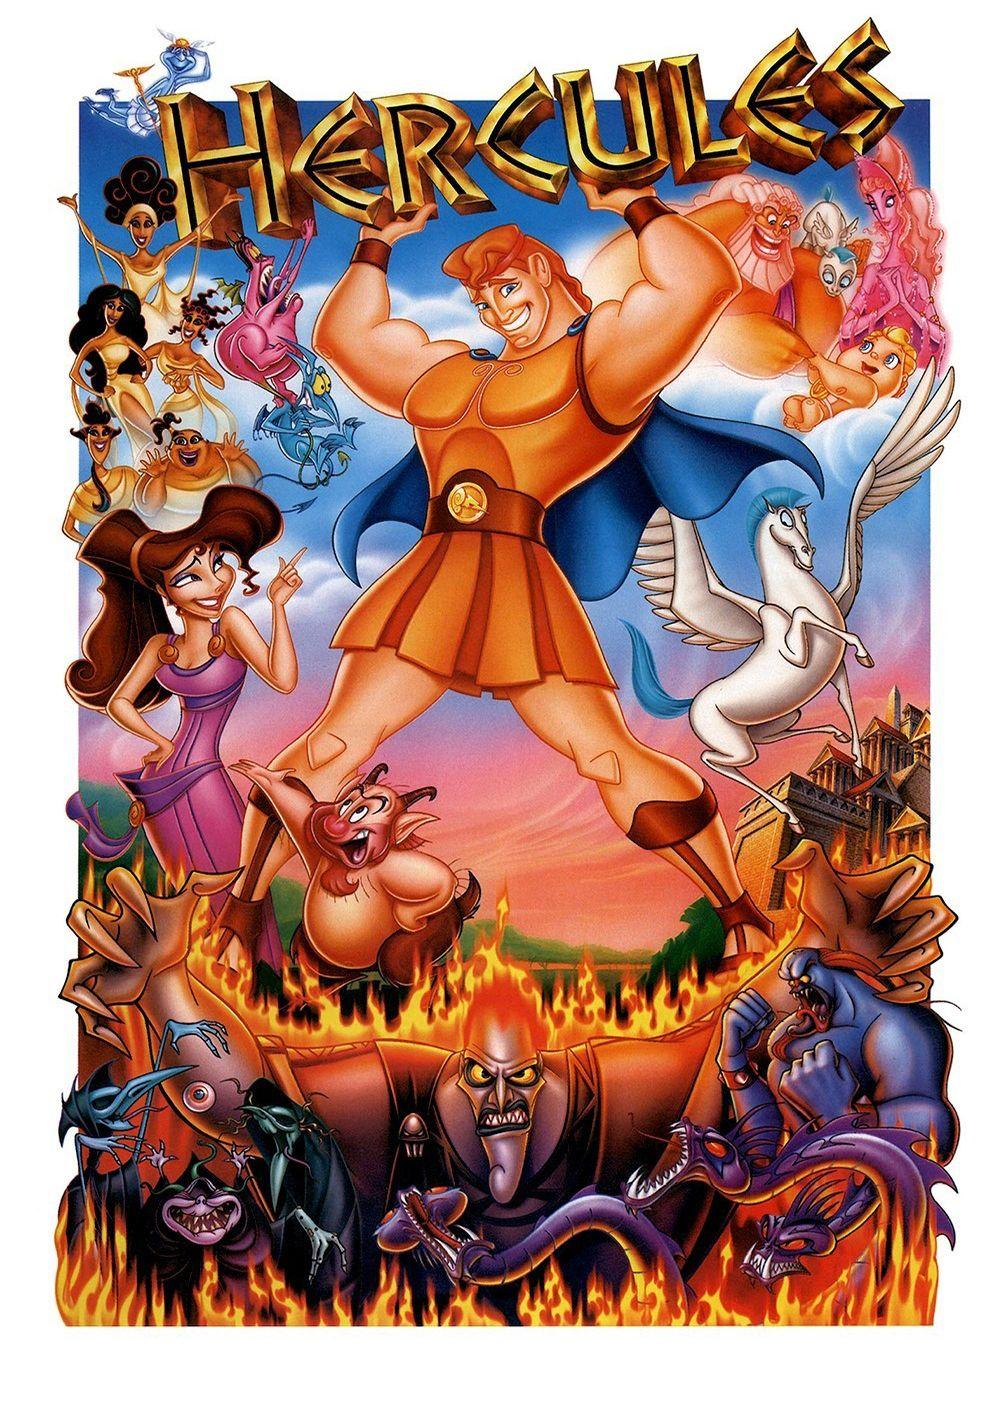 Hercules 1997 zero to hero animated movie posters